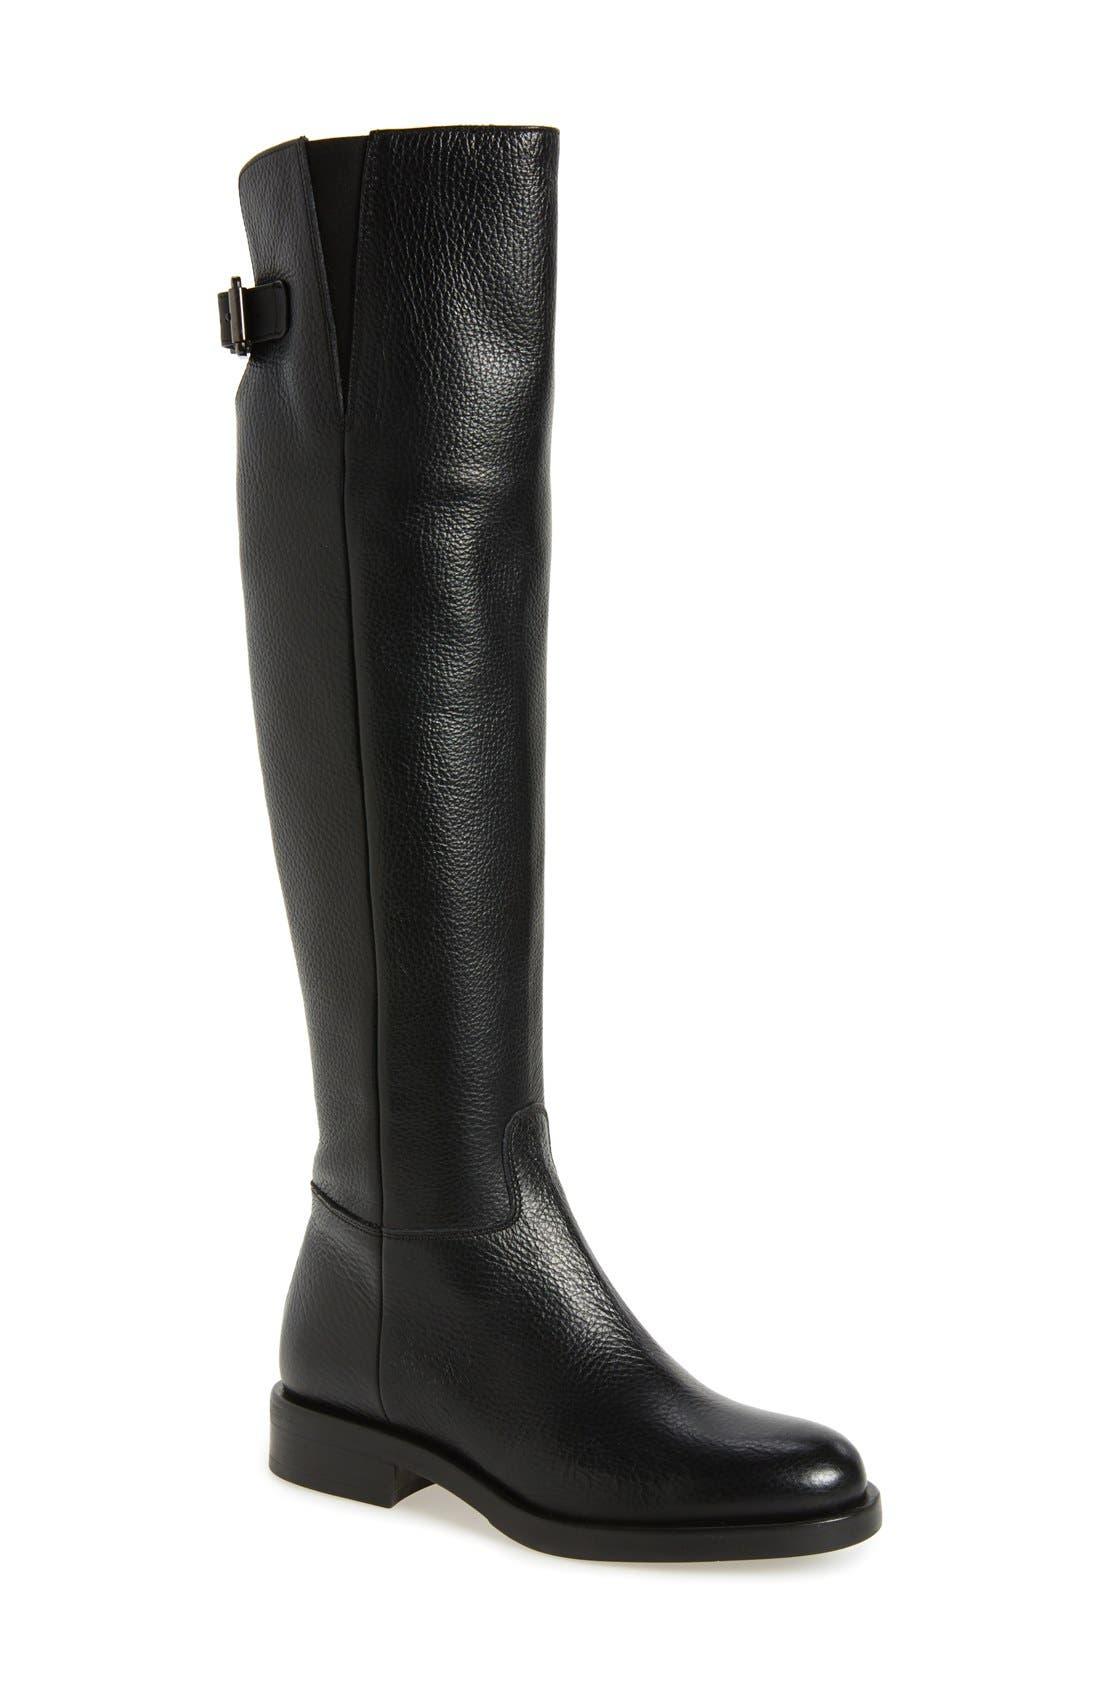 Alternate Image 1 Selected - Tiffi Tall Riding Boot (Women)